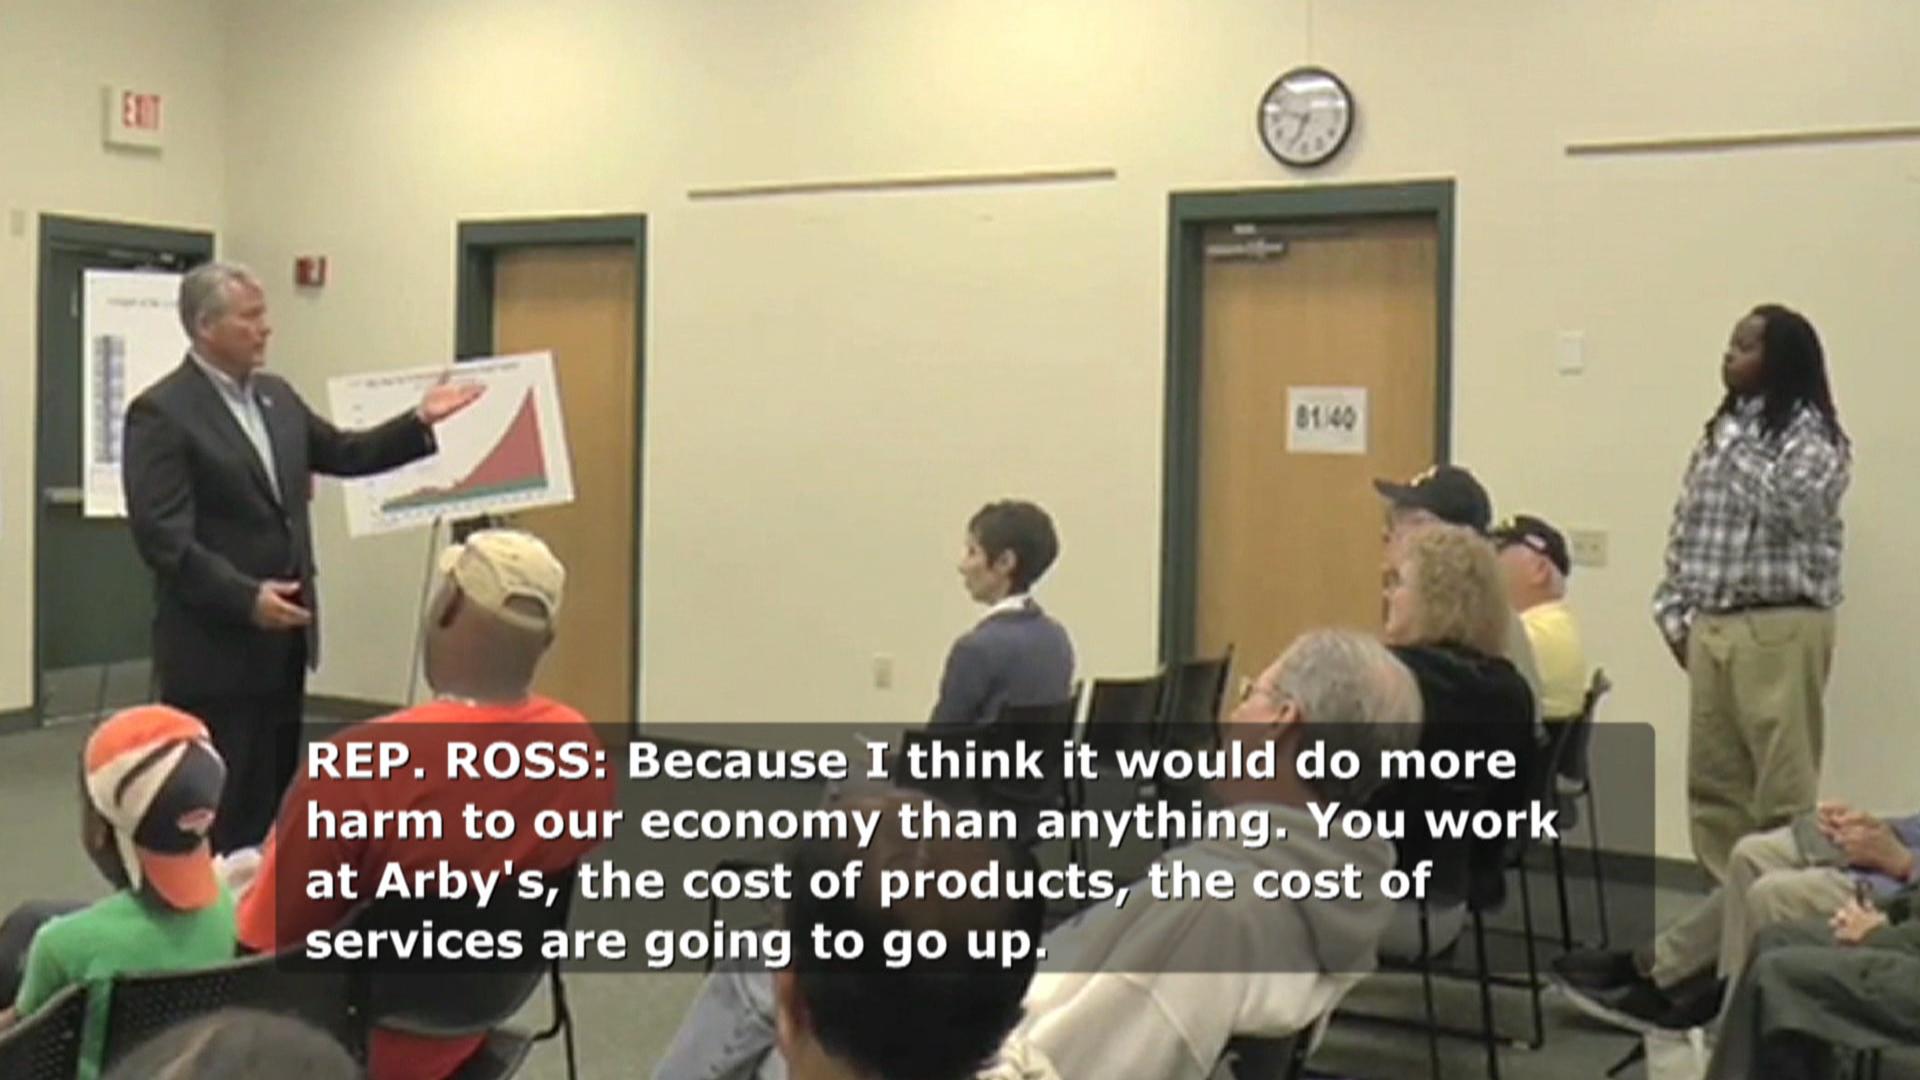 Low-wage worker confronts GOP congressman